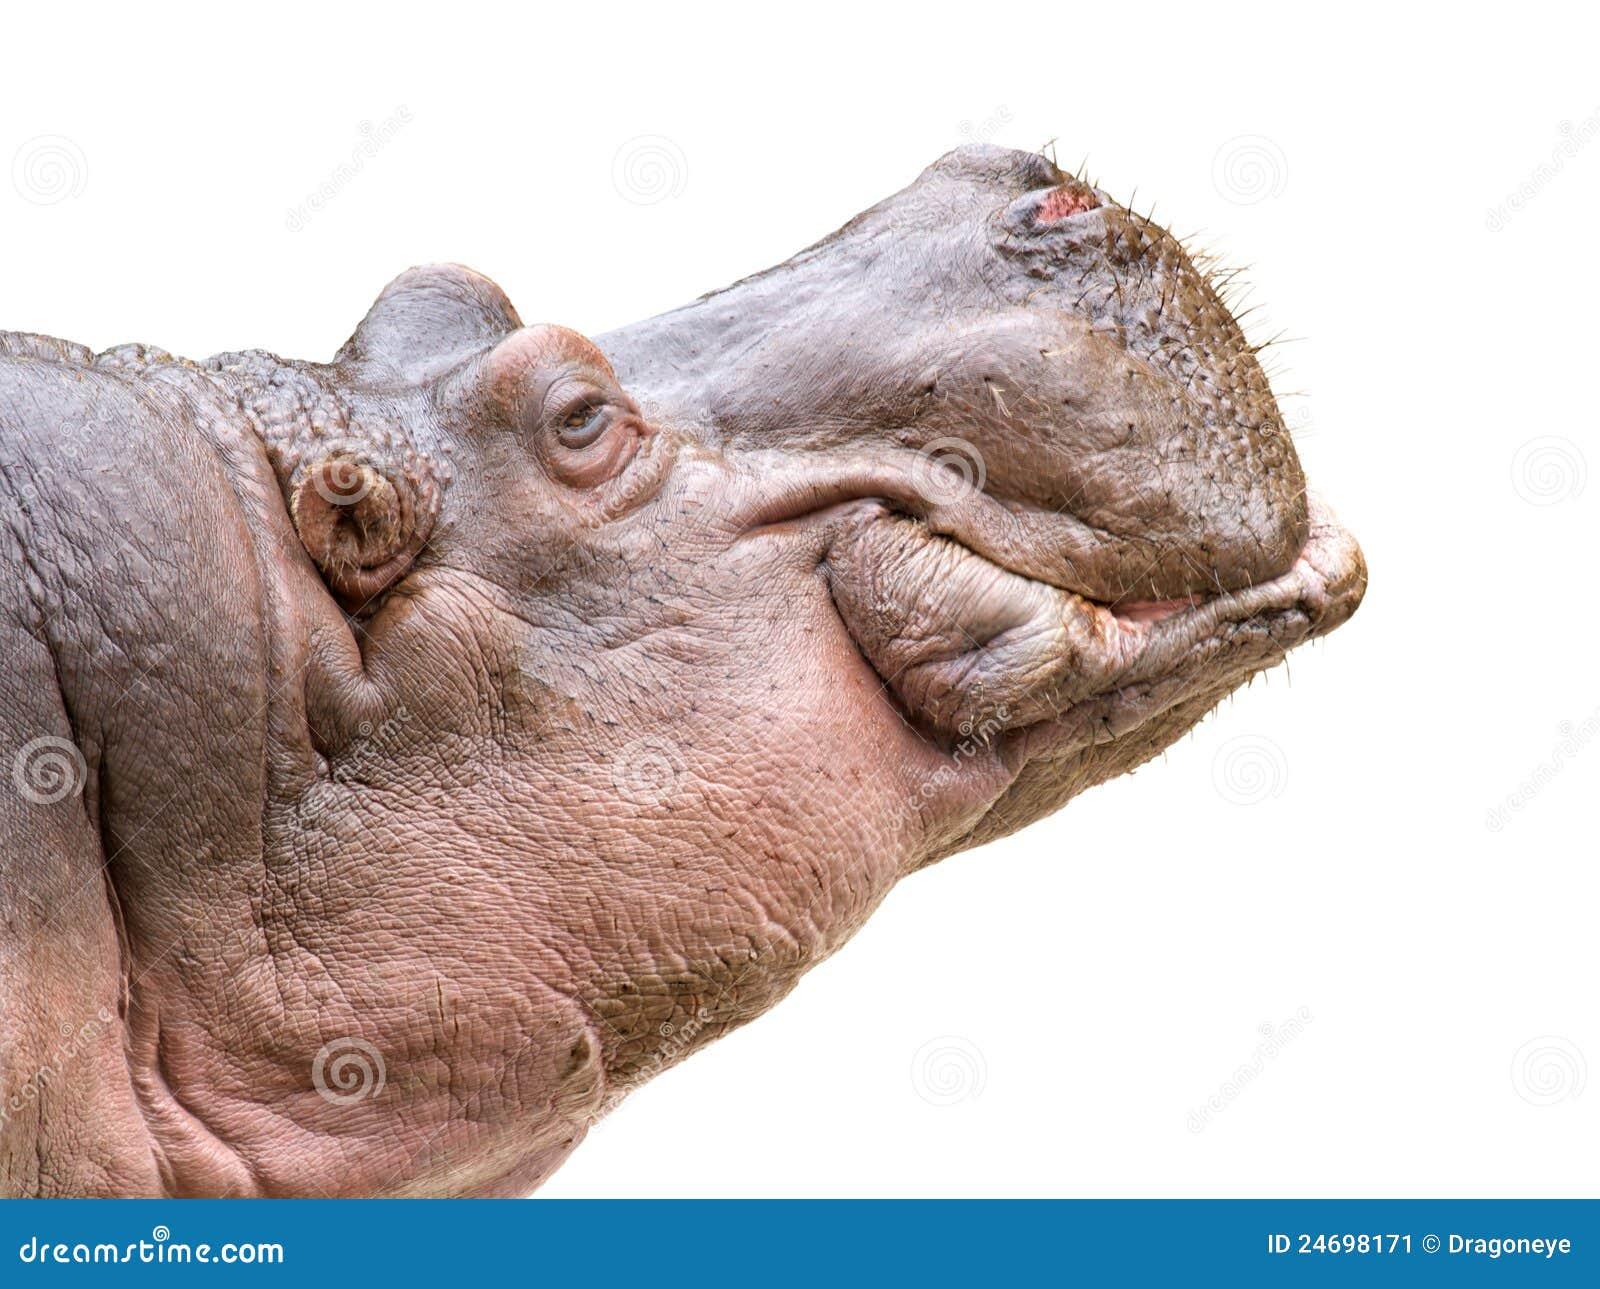 Hippo Head On White Stock Image - Image: 24698171